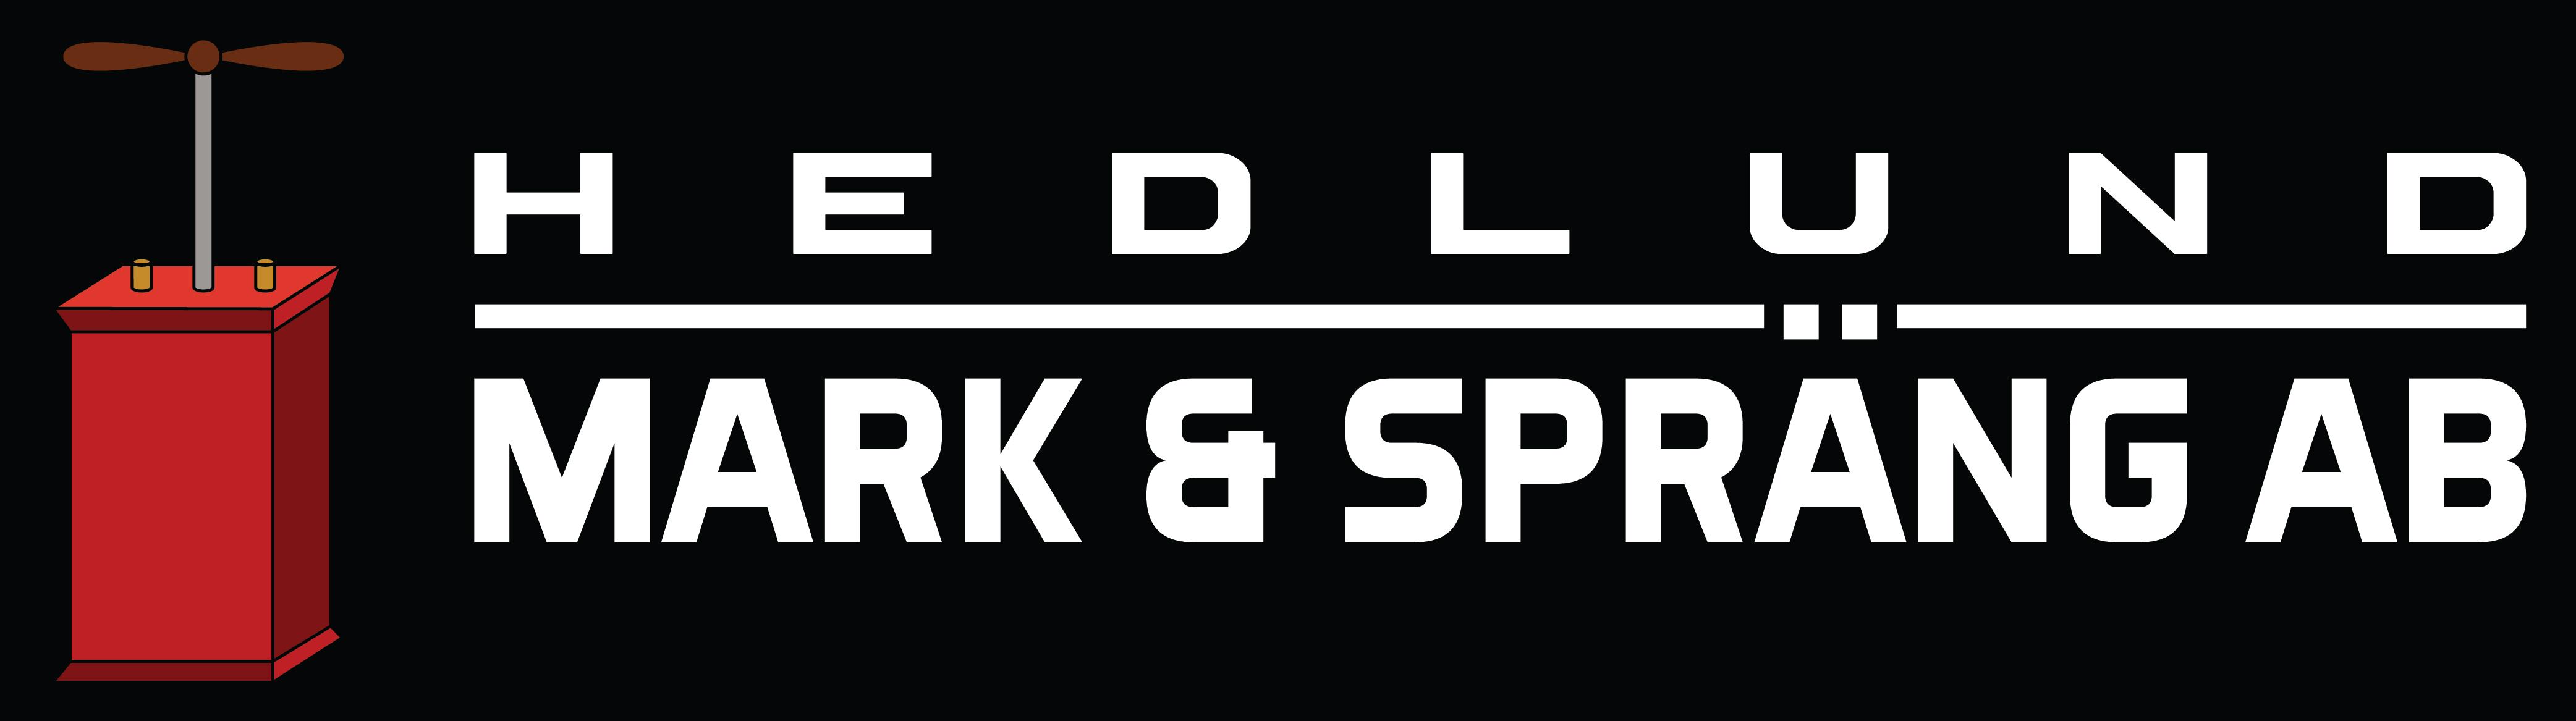 Hedlund Mark & Spräng AB